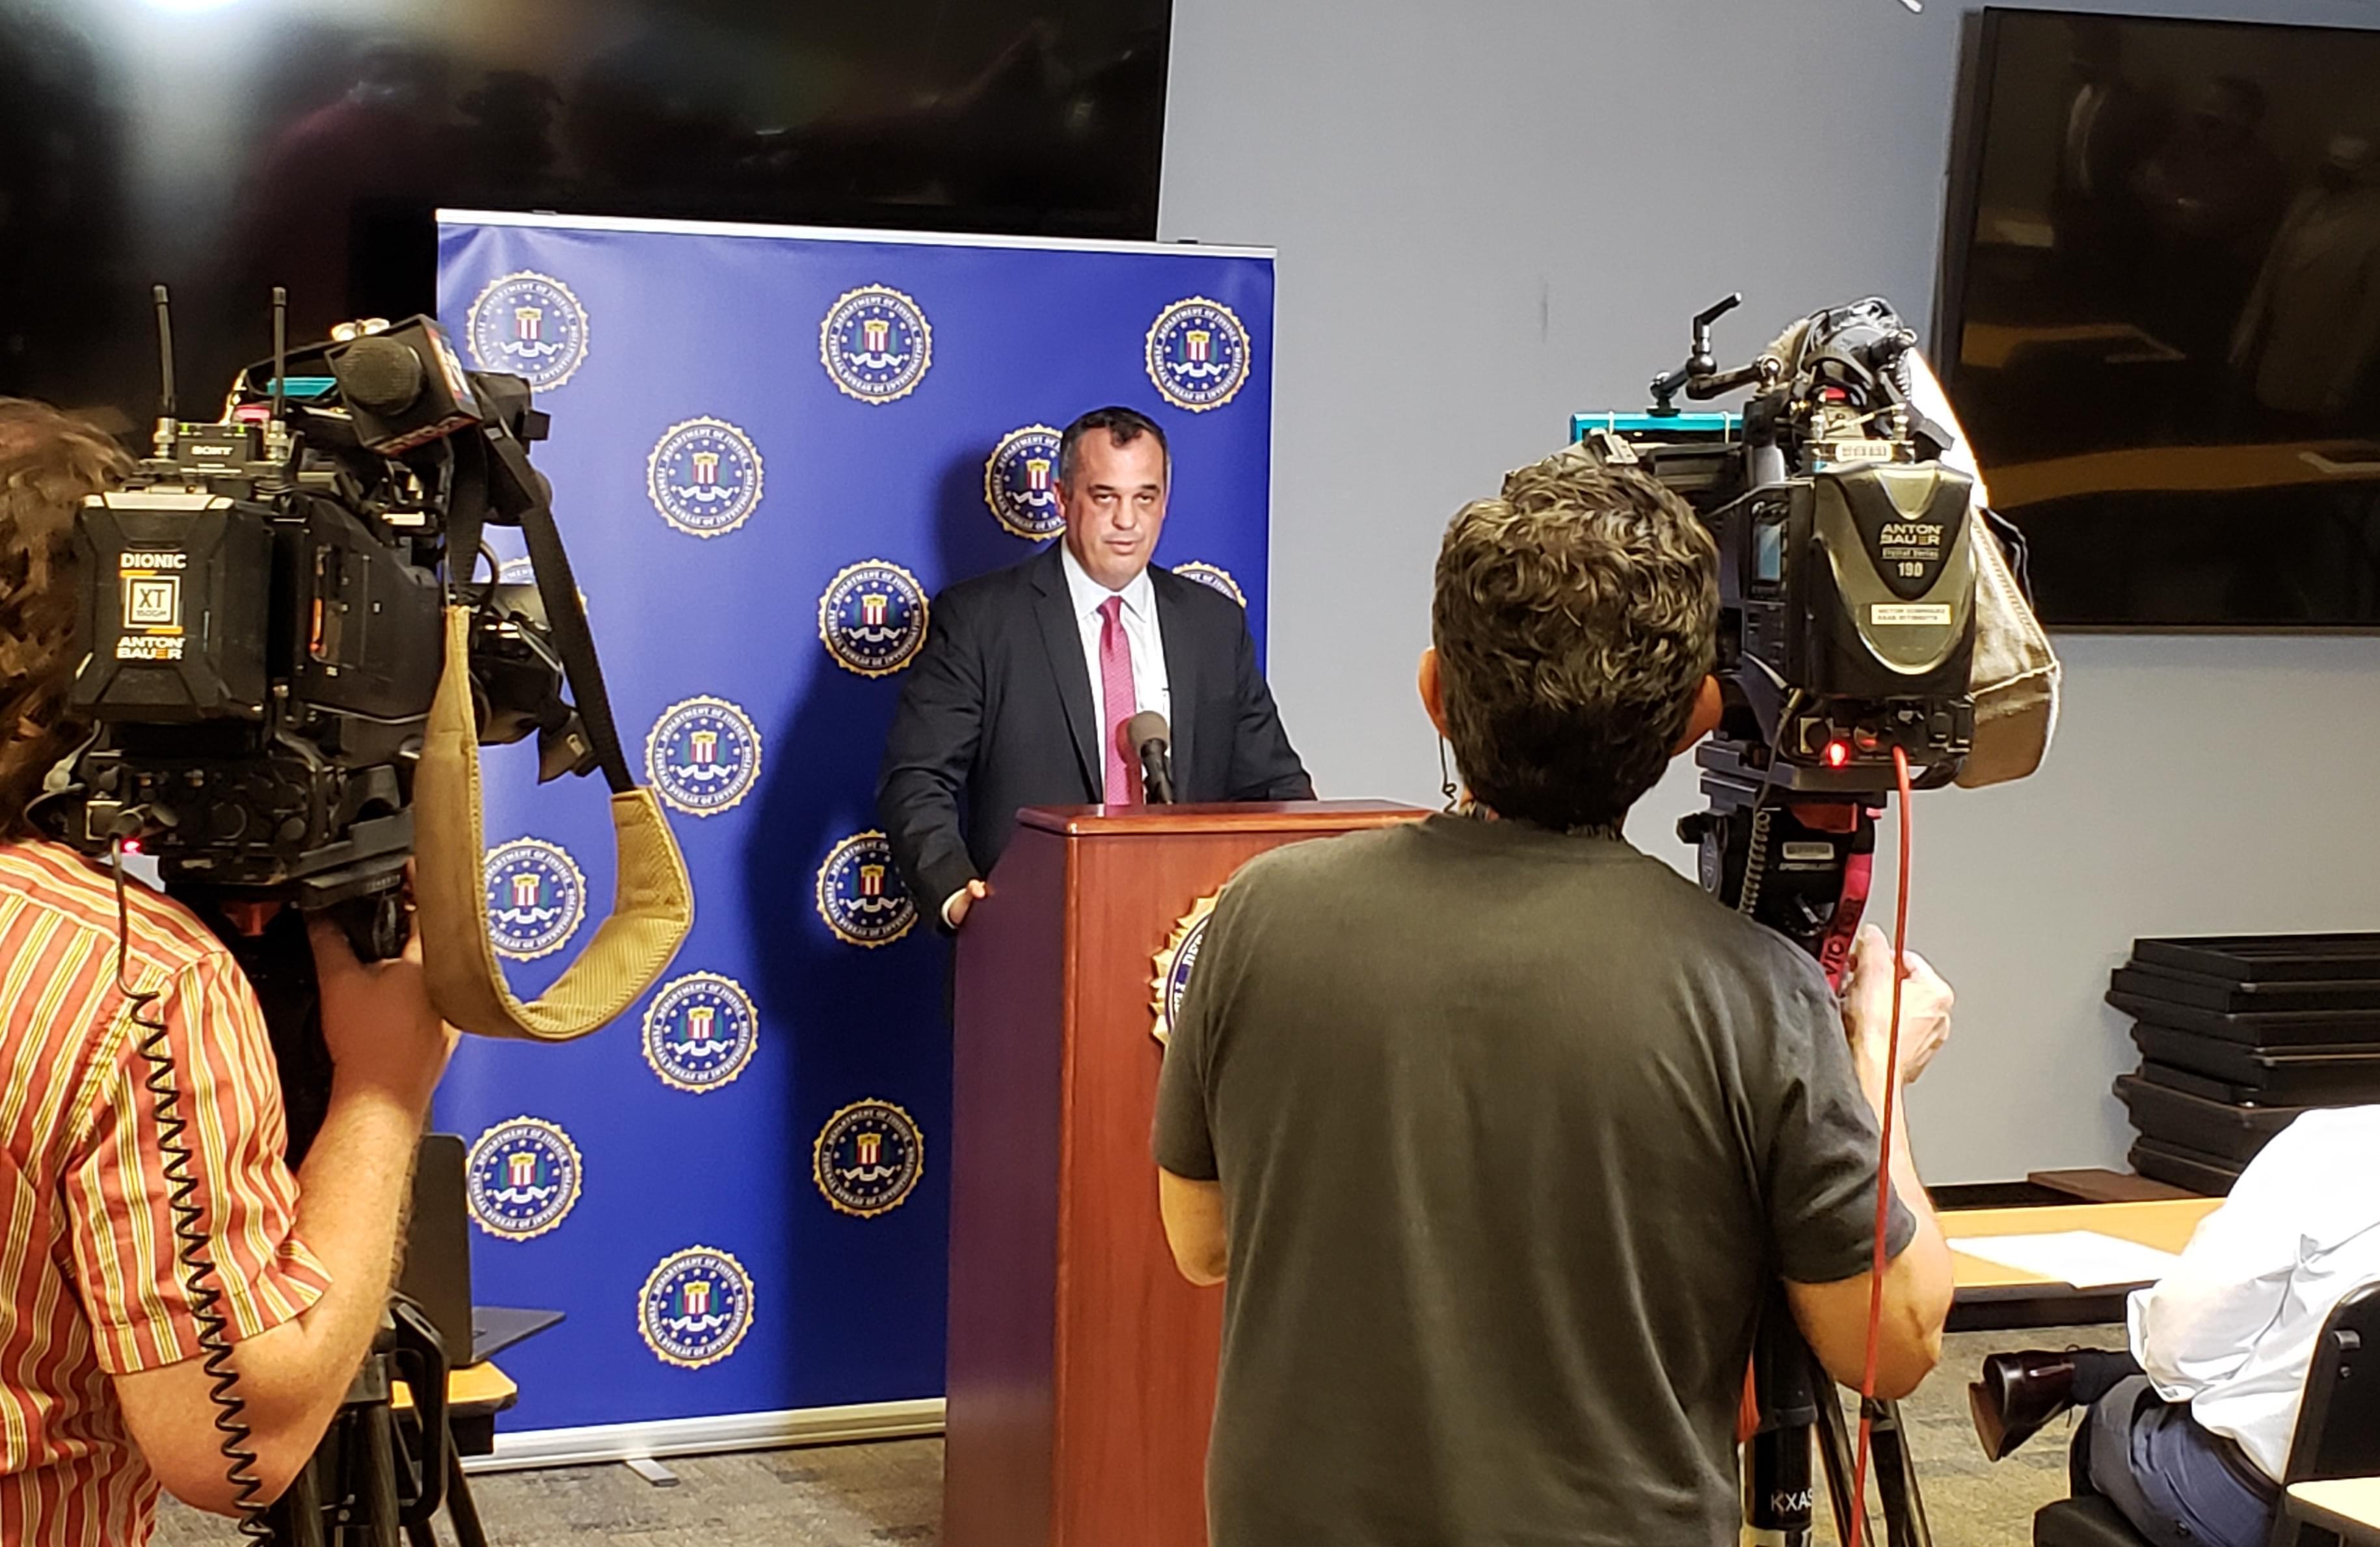 FBI Denies Claim from Former Dallas Police Chief Regarding Murder Investigation Involving Dallas Officer